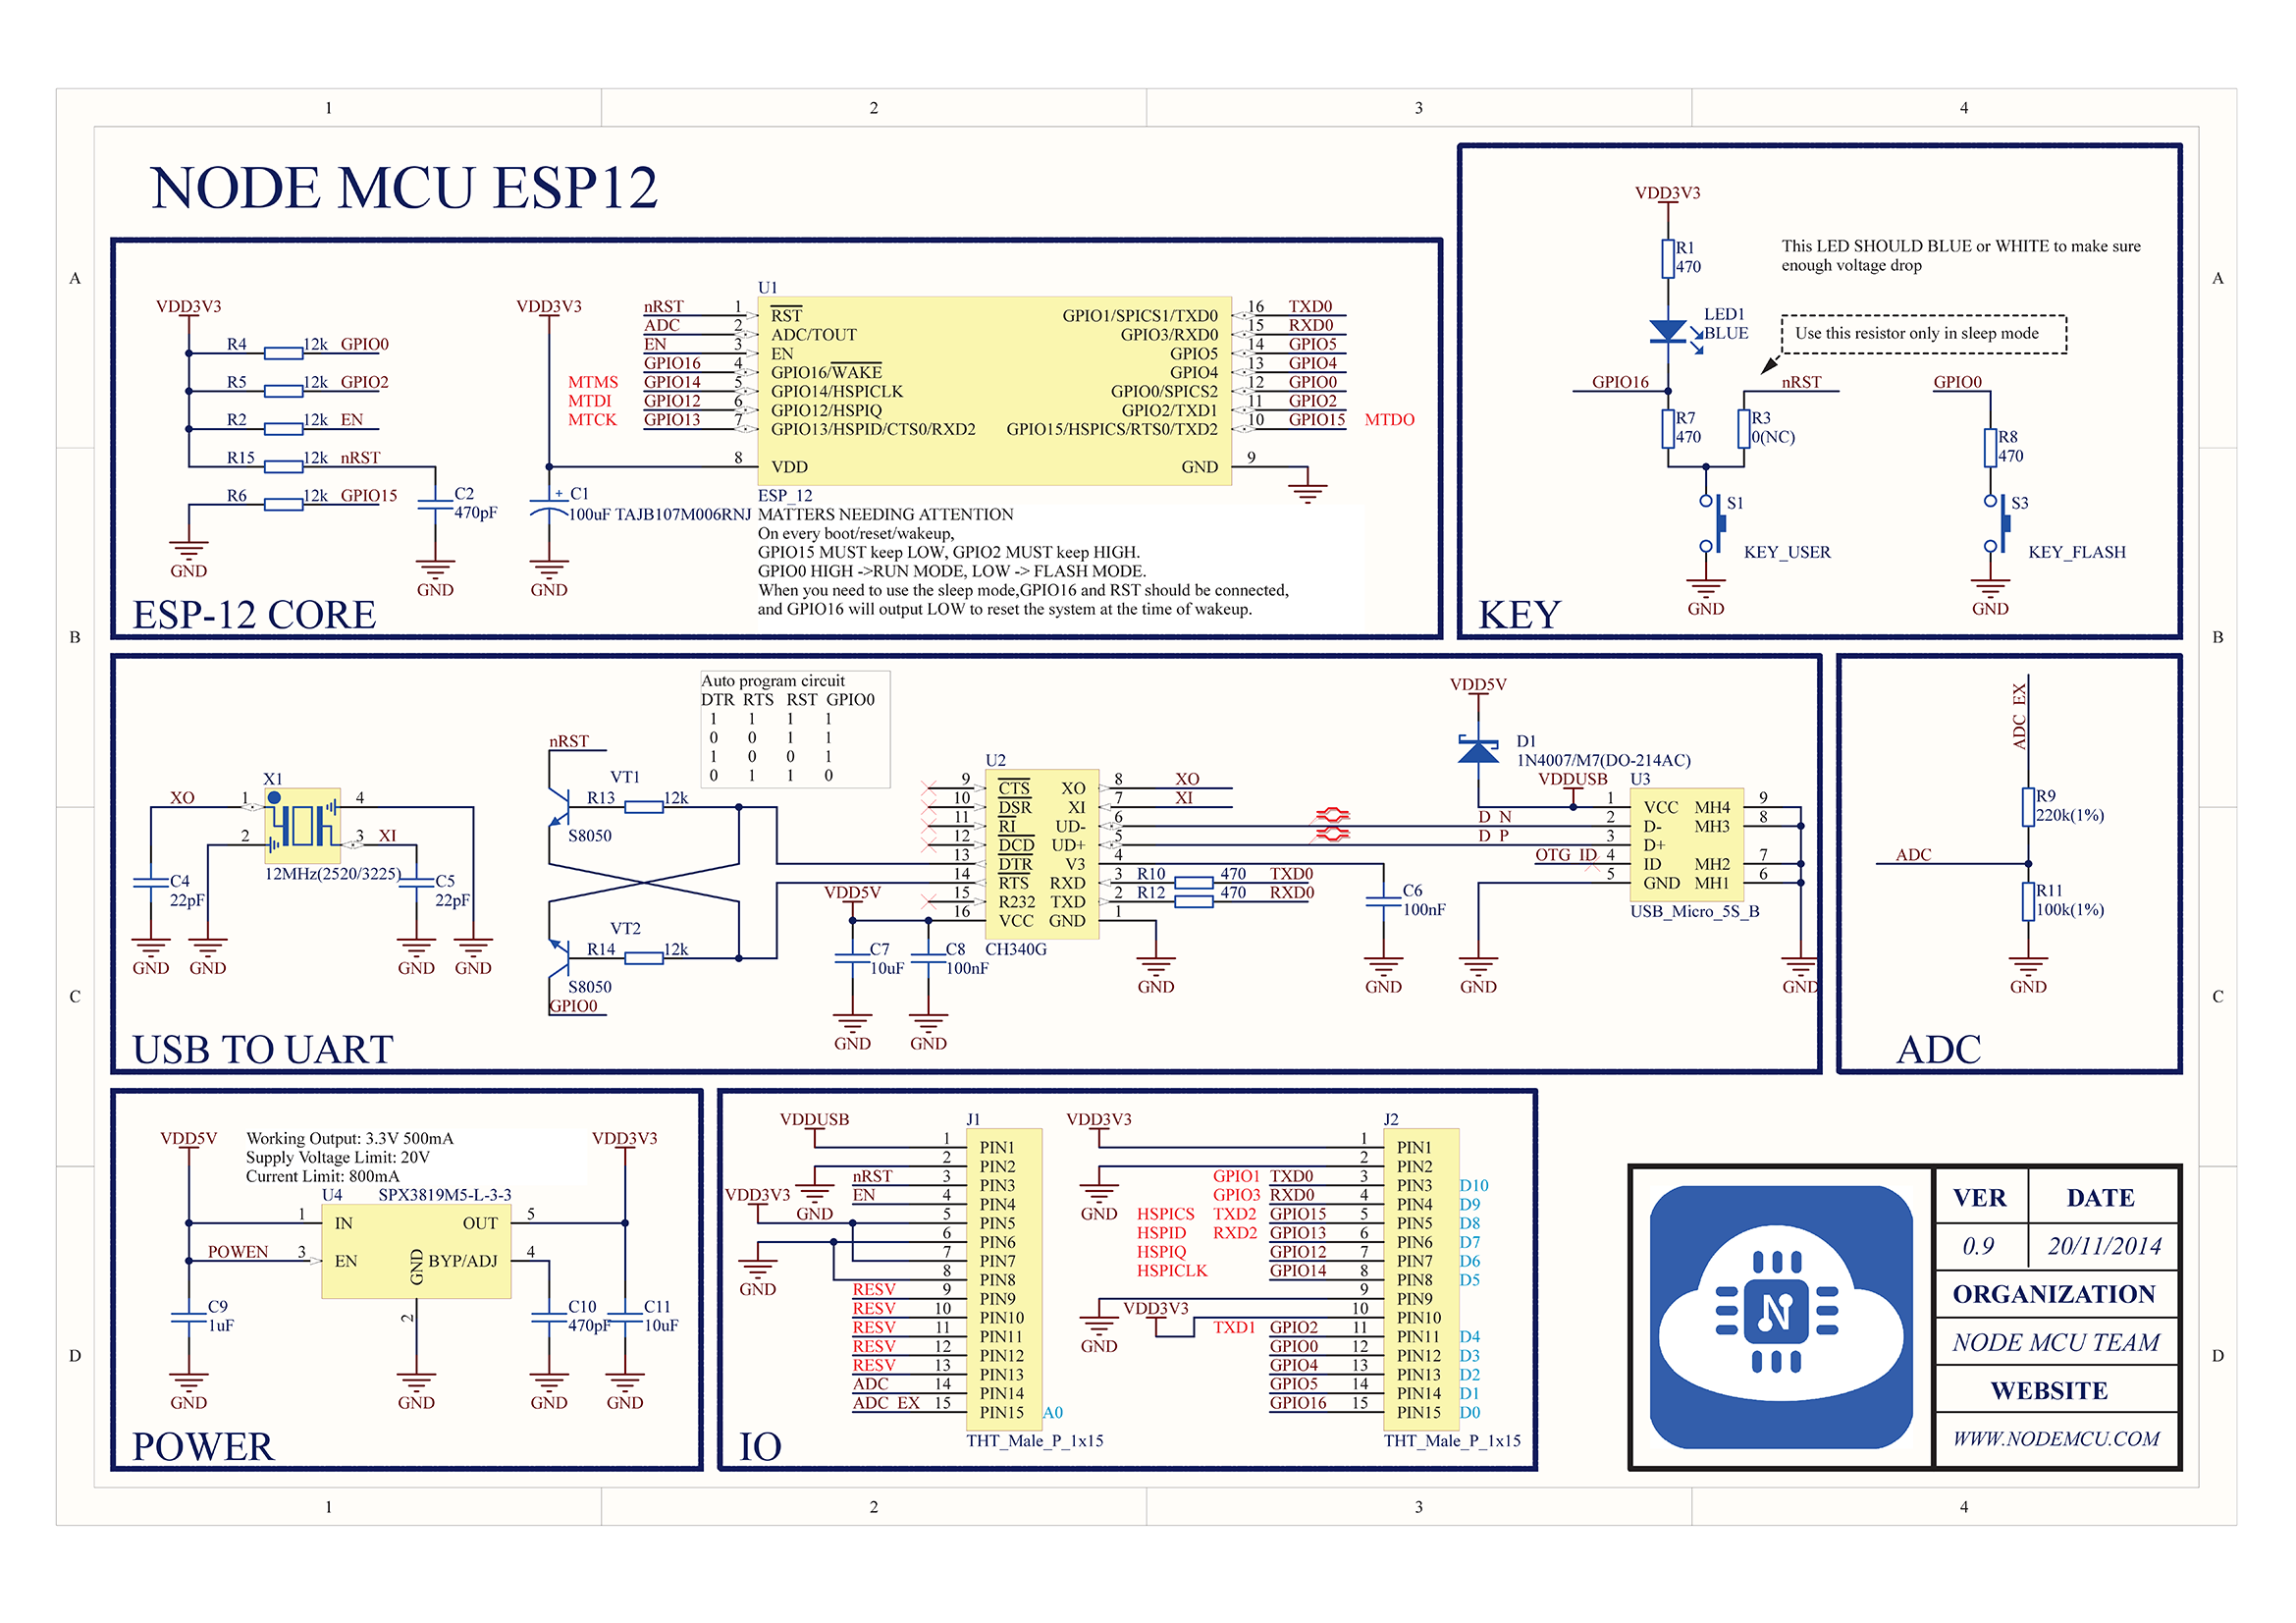 V3 4M bytes (32Mbits) FLASH NodeMcu Lua WIFI Networking development board Based ESP8266 with firmware